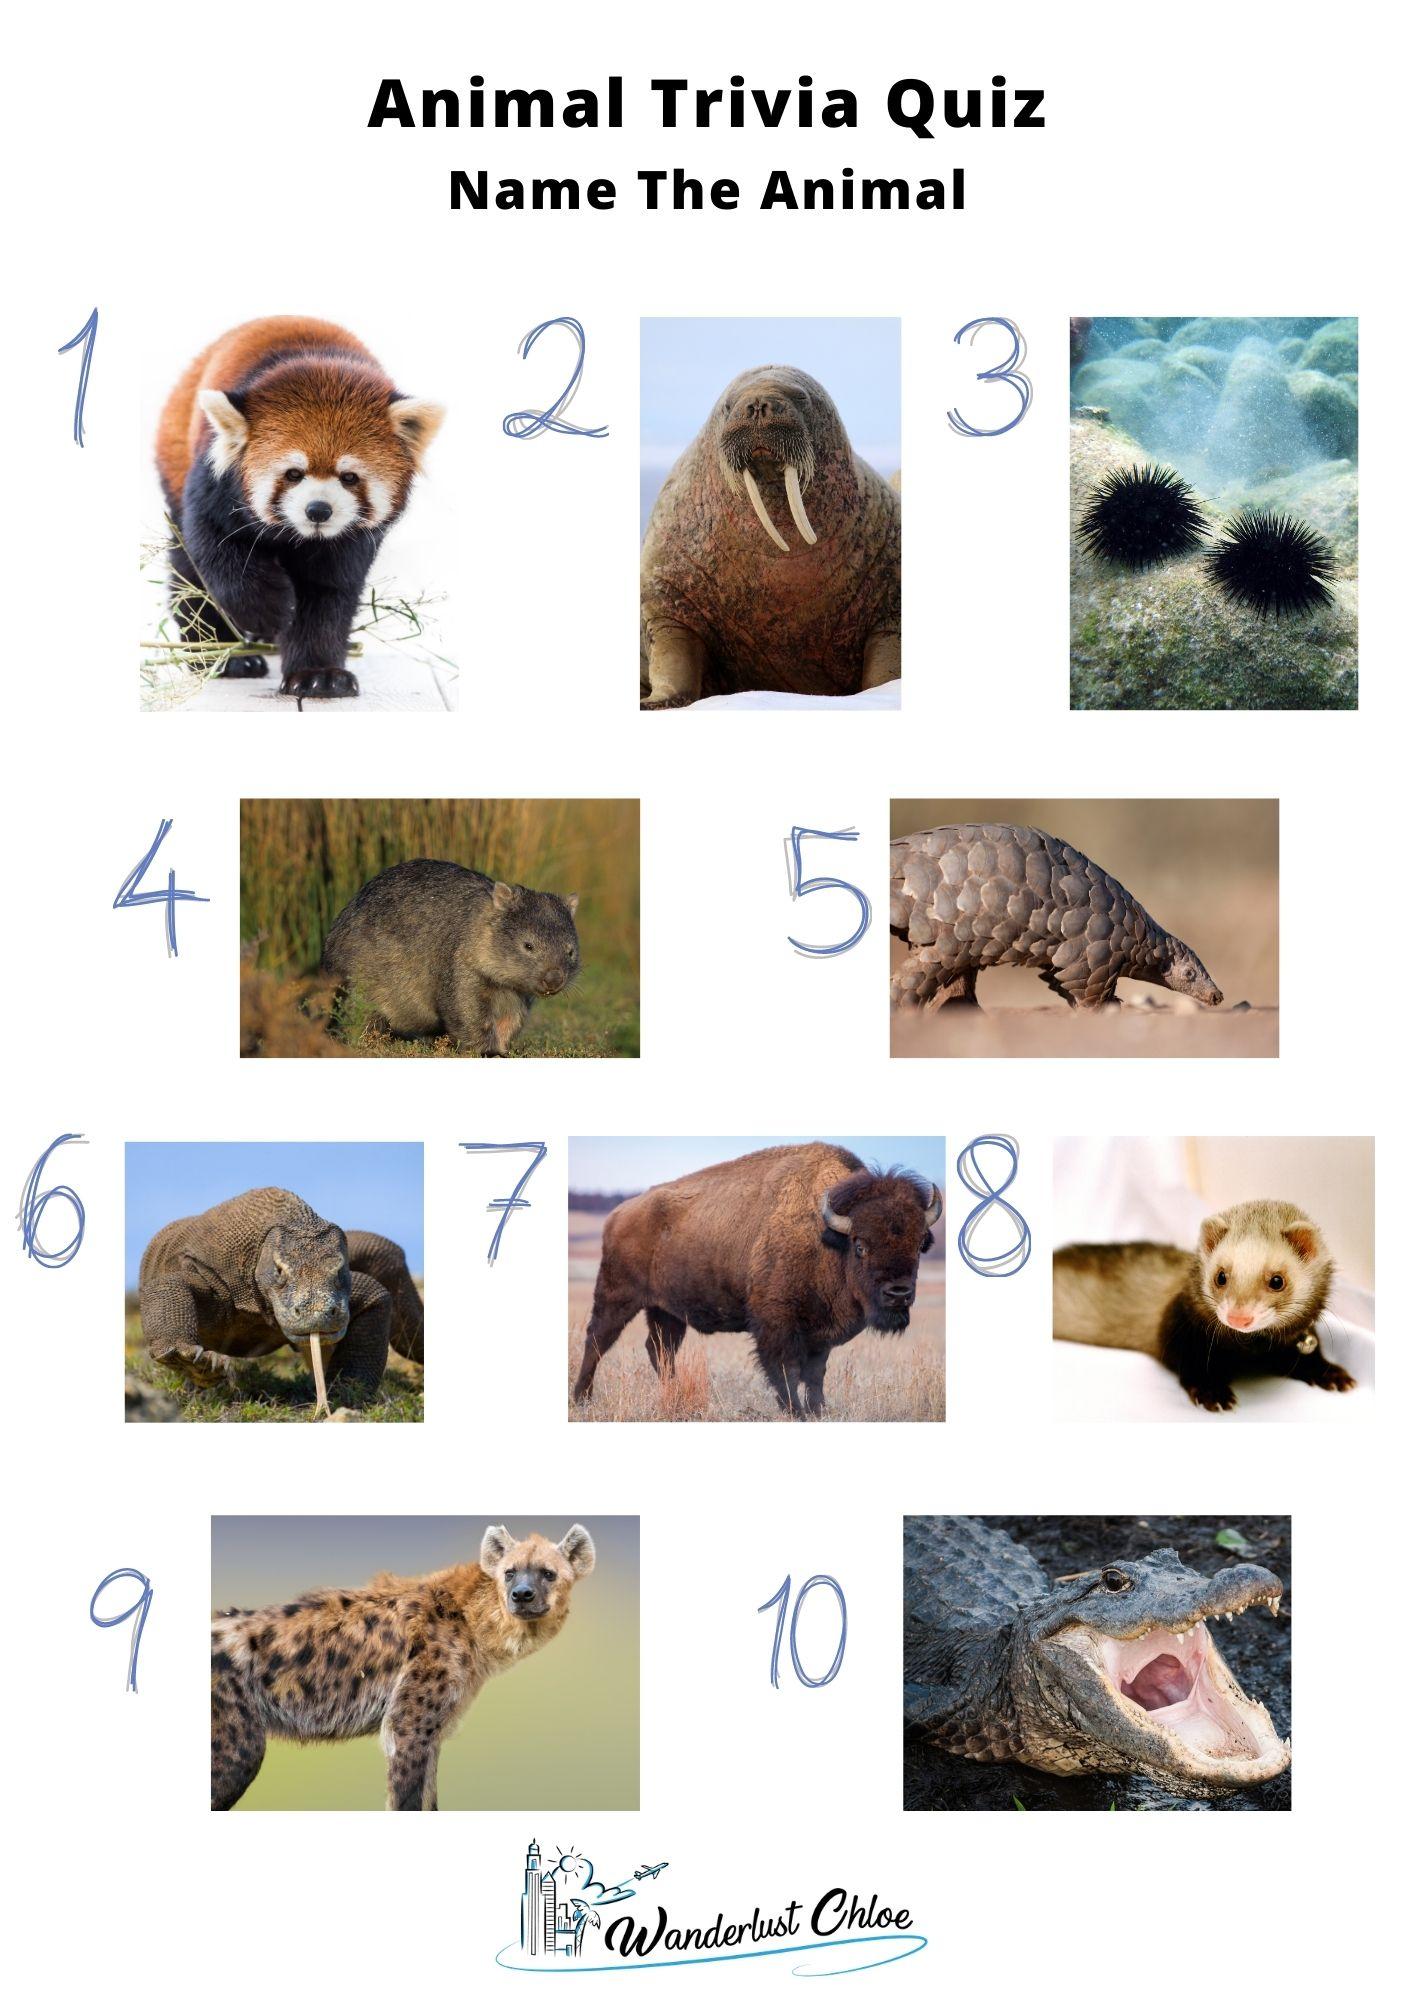 Animal Trivia Quiz